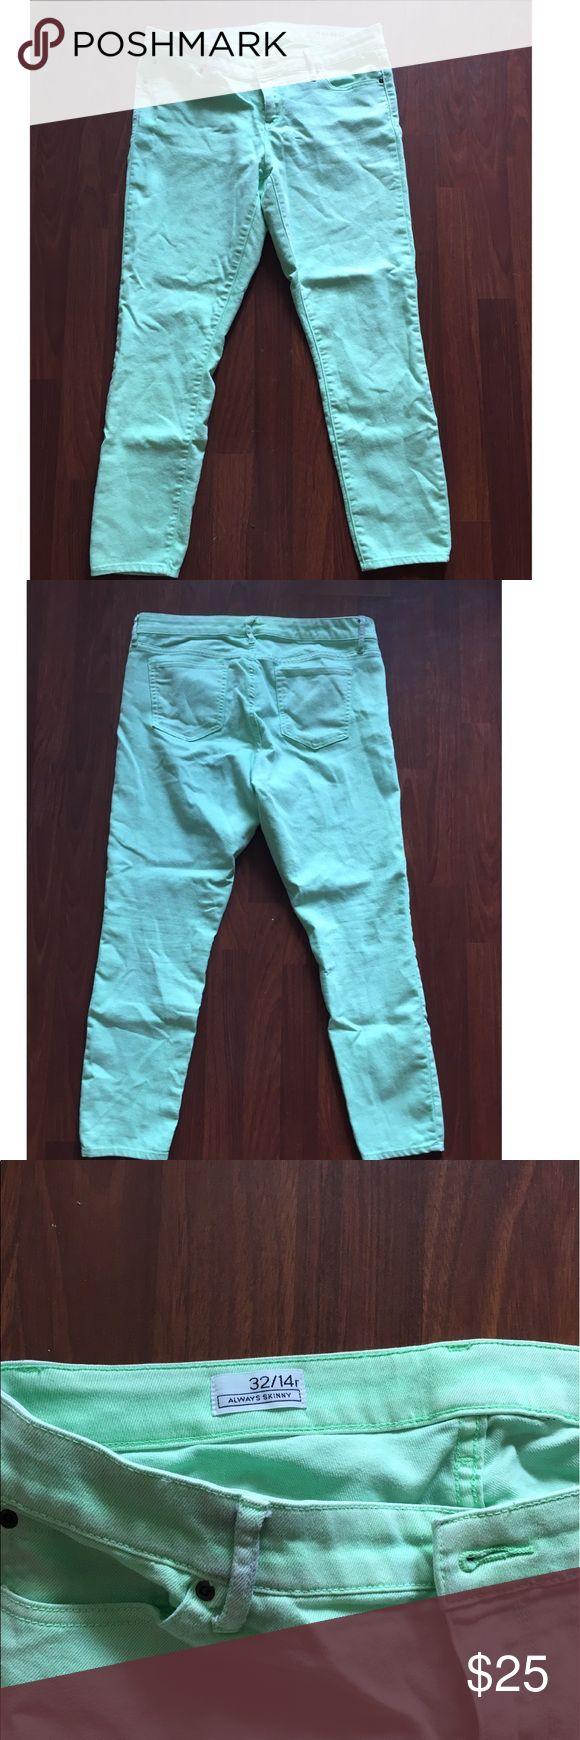 Gap - Always Skinny Mint Green Jeans Gently worn! Lovely mint color. Always Skinny fit. GAP Jeans Skinny